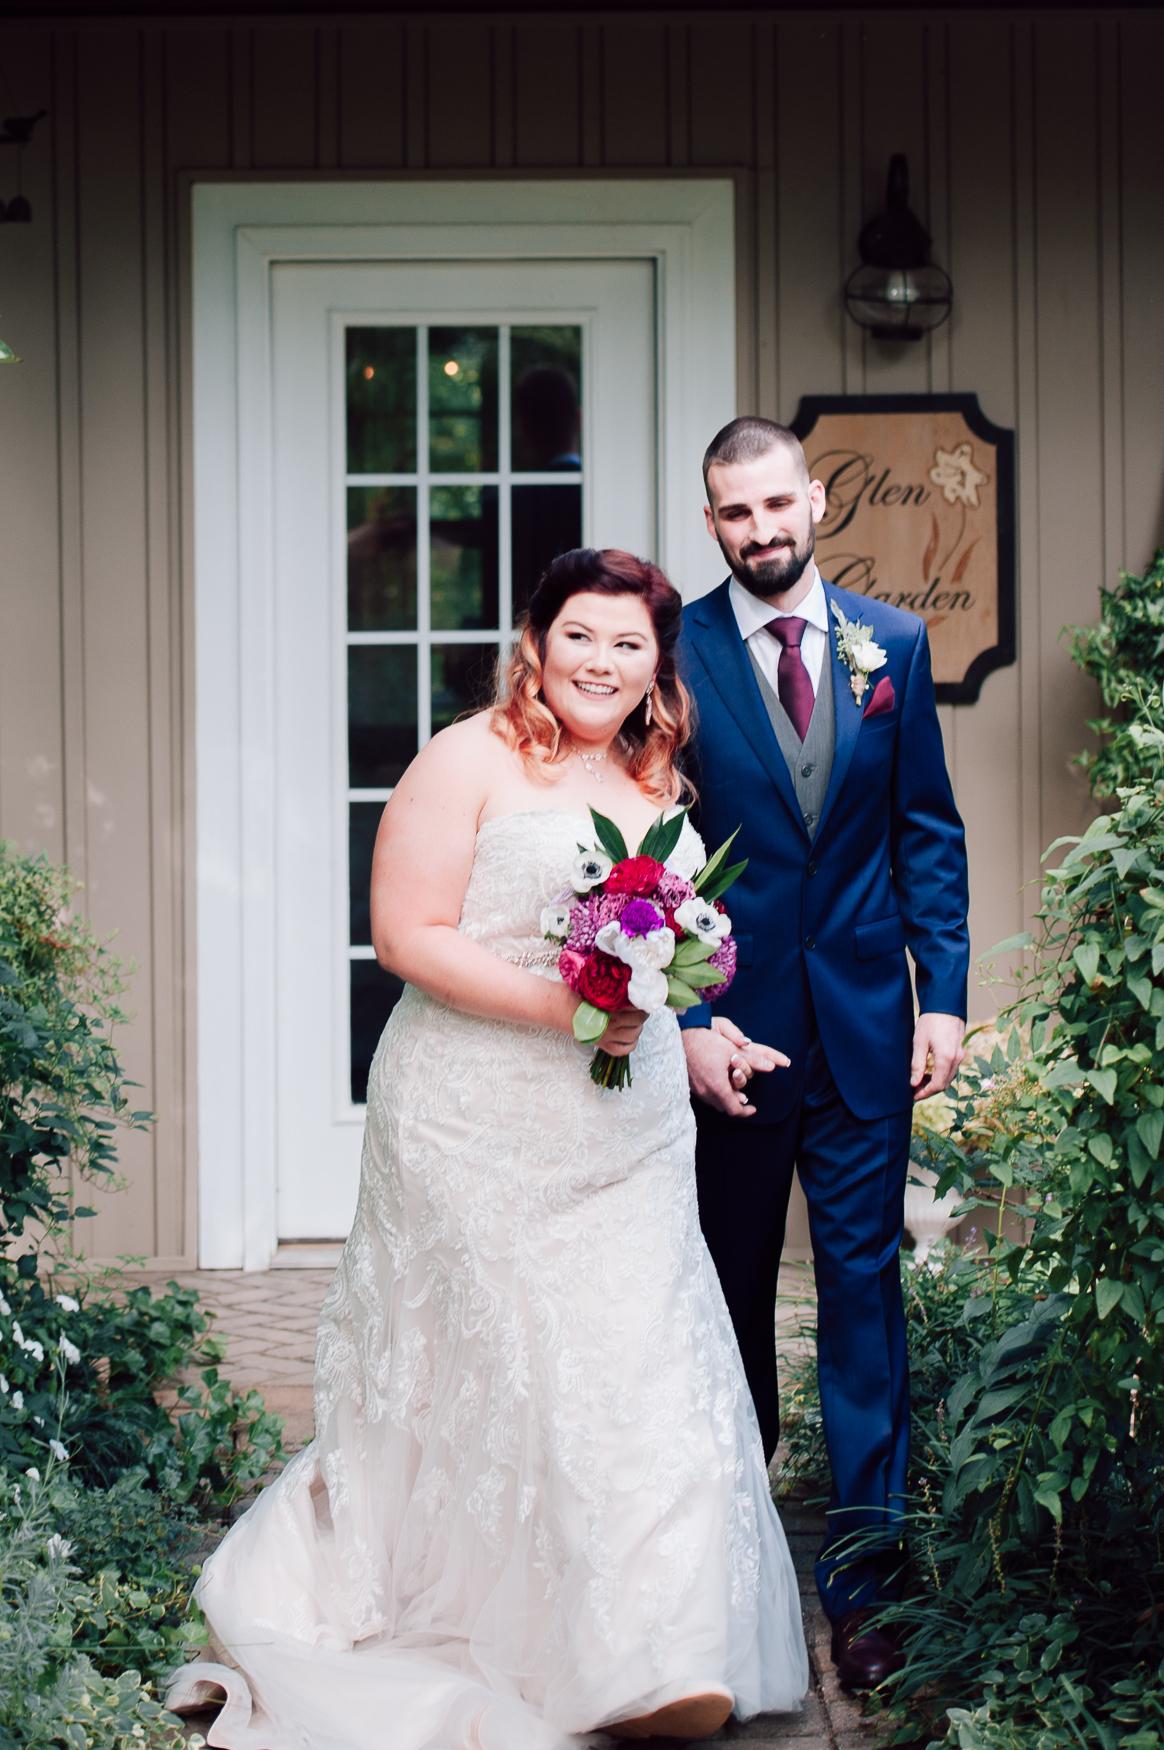 virginiawedding_GlenGarden_rusticwedding_fredericksburg_youseephotography_KellySteven (48).jpg